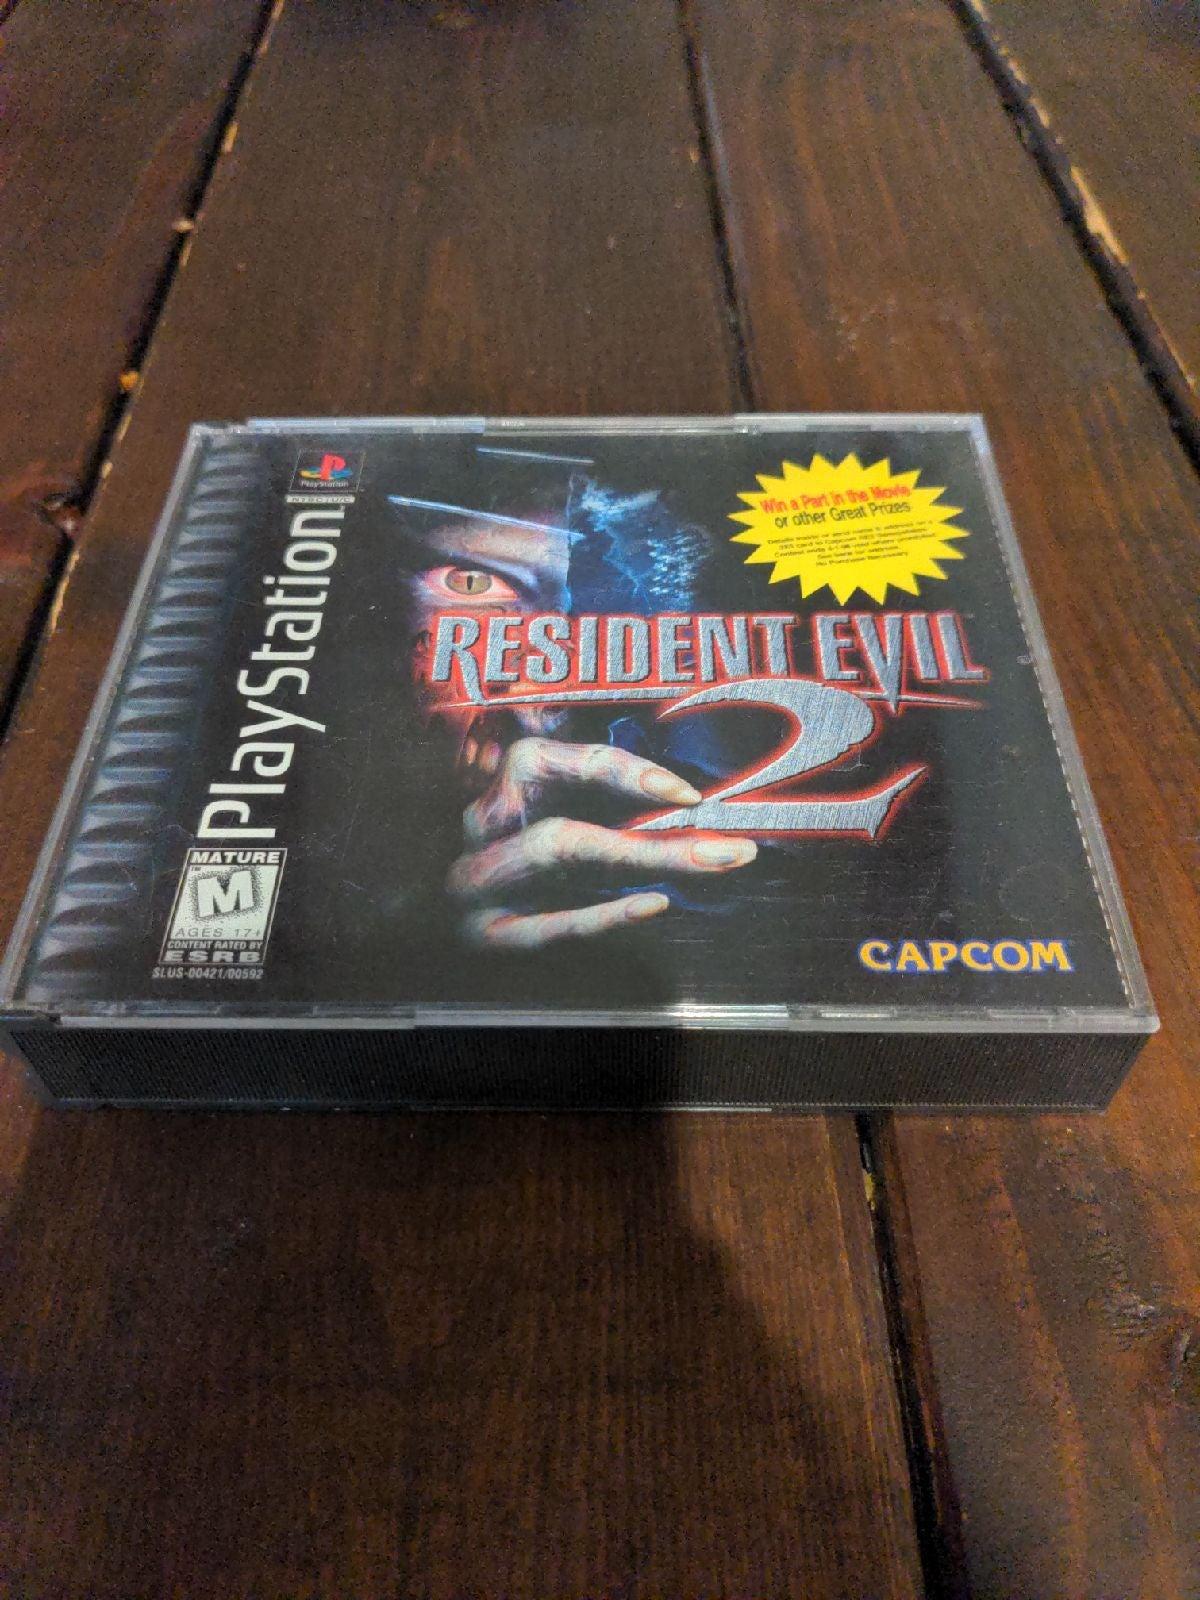 Resident Evil 2 on Playstation 1